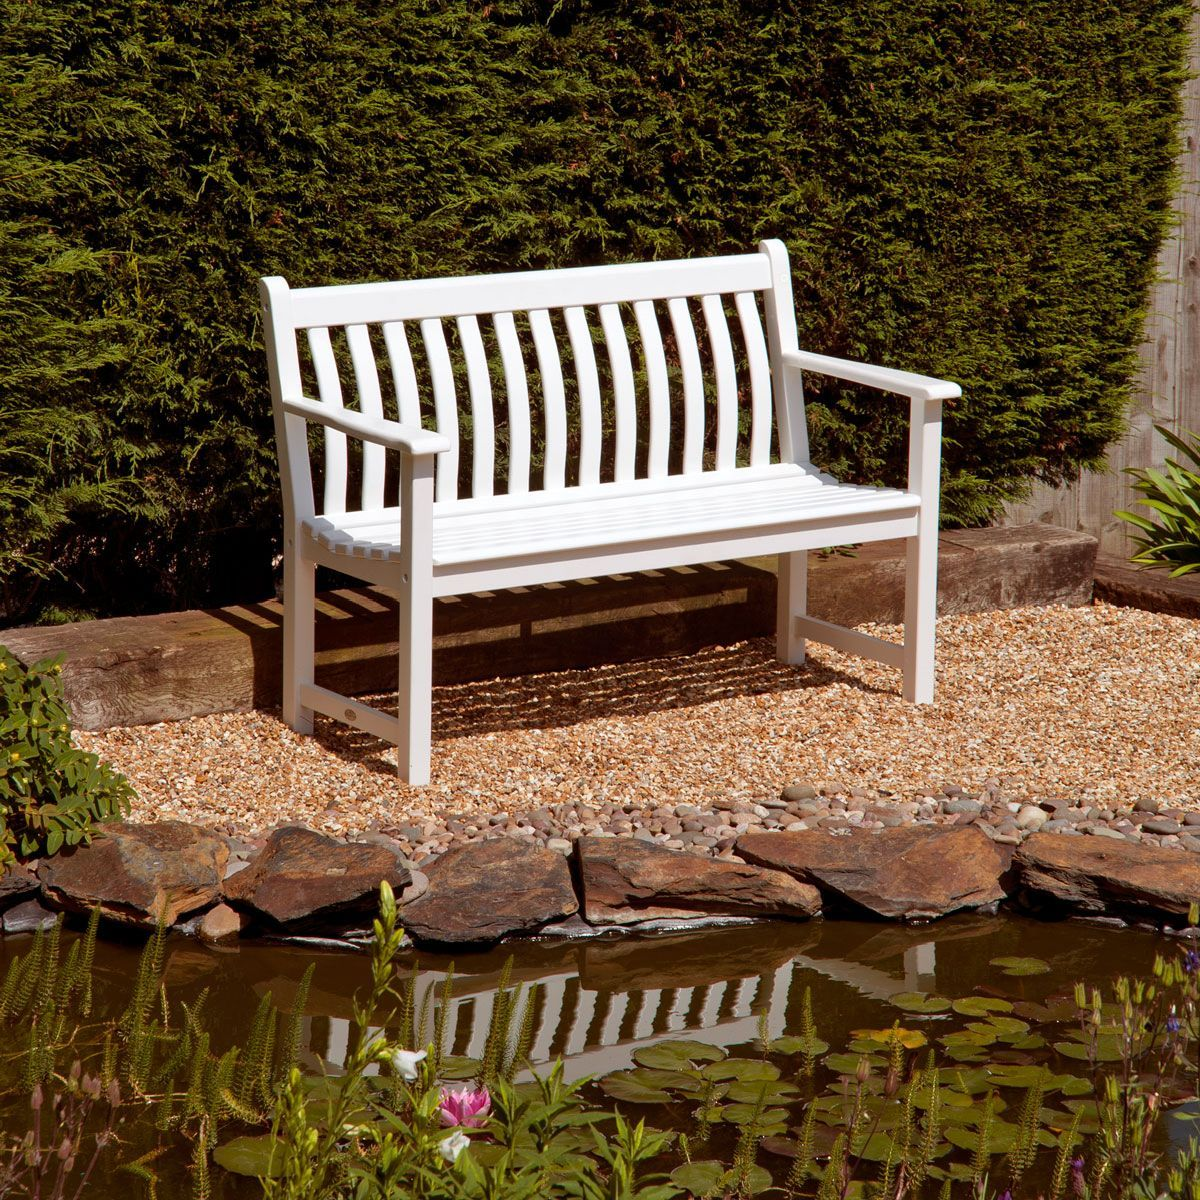 Miraculous Alexander Rose White Broadfield Garden Bench 4Ft Notcutts Forskolin Free Trial Chair Design Images Forskolin Free Trialorg